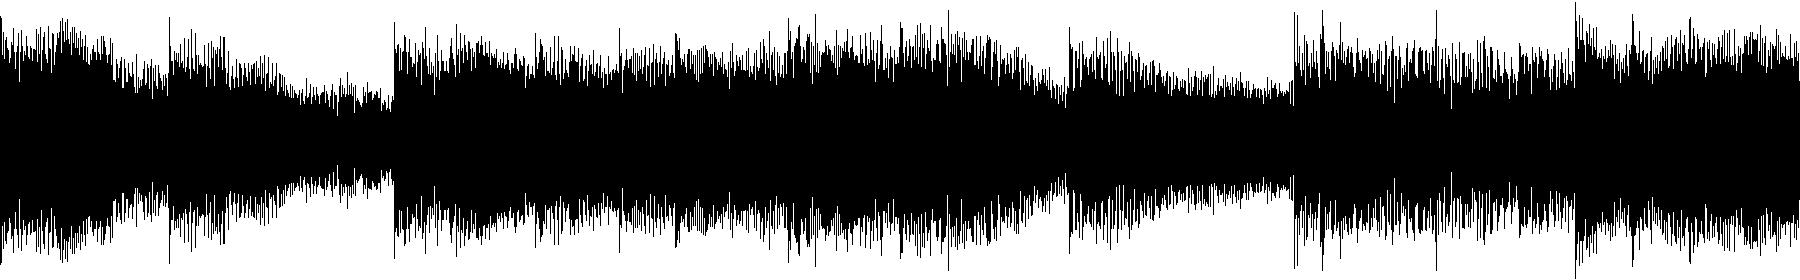 vedh melodyloop 070 d minor 120bpm